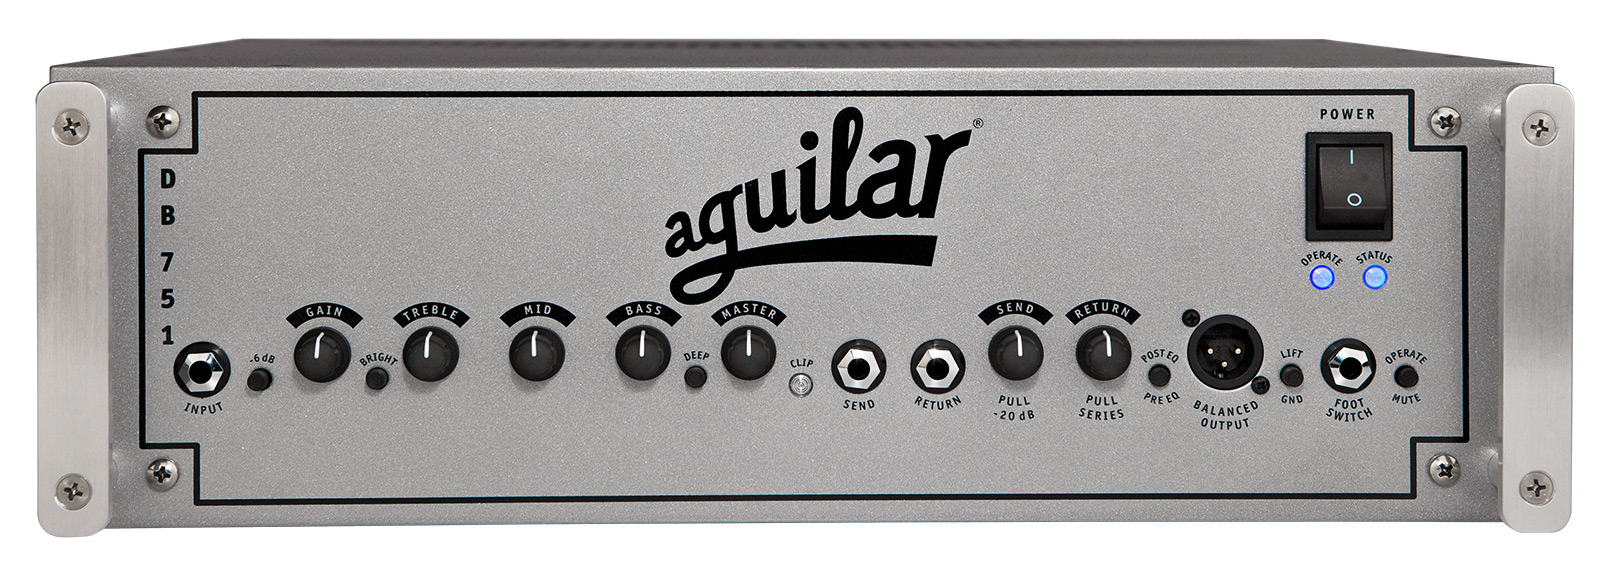 Aguilar DB751 Hybrid Bass Amplifier Head